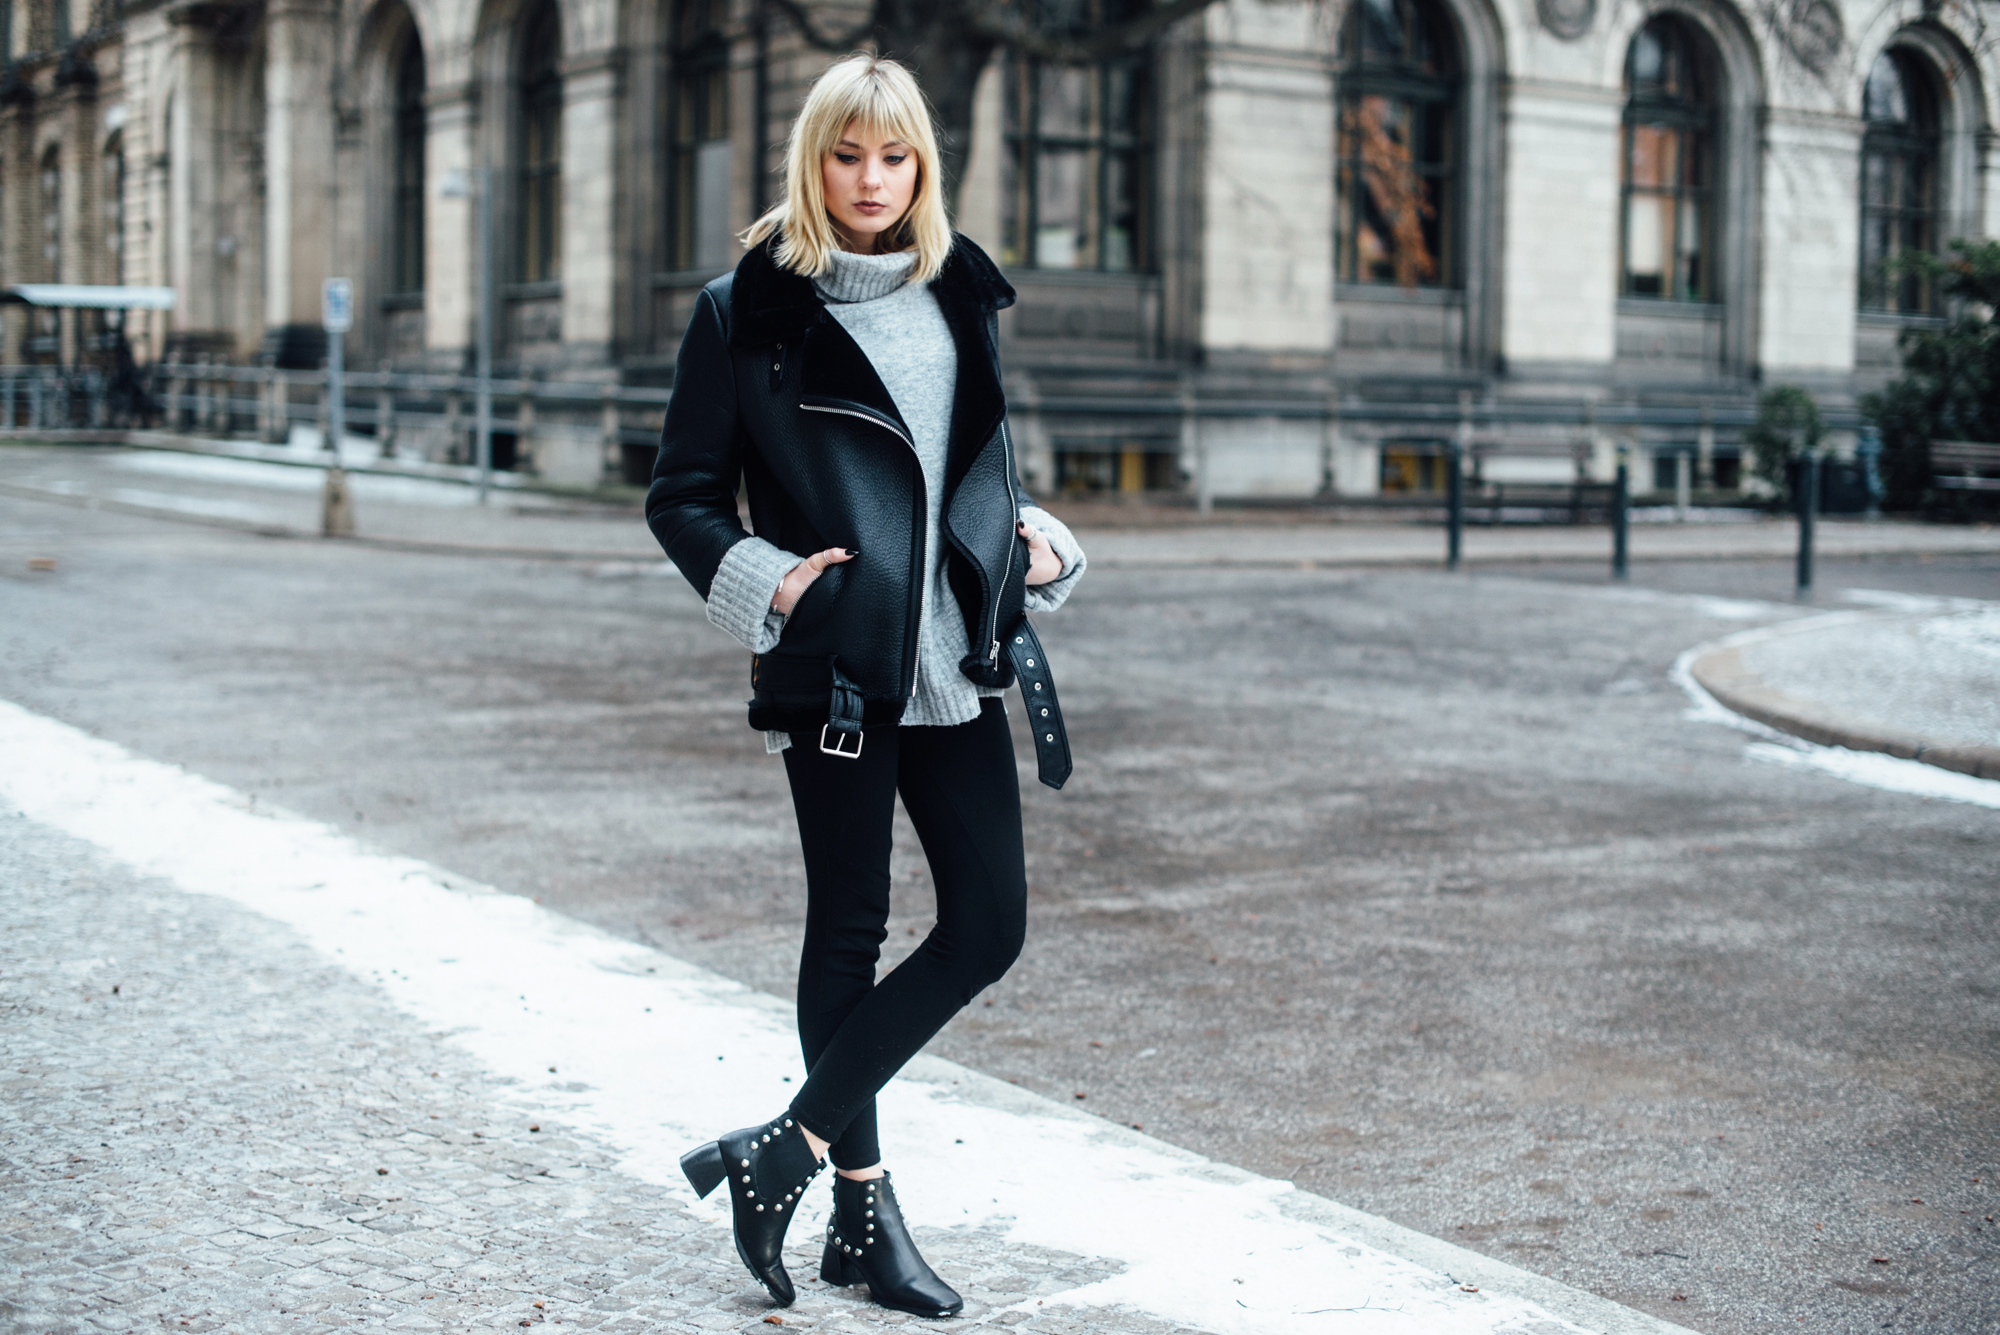 04-Kiamisu-Modeblog-Fashion Week Berlin_Shearling Jacke-10